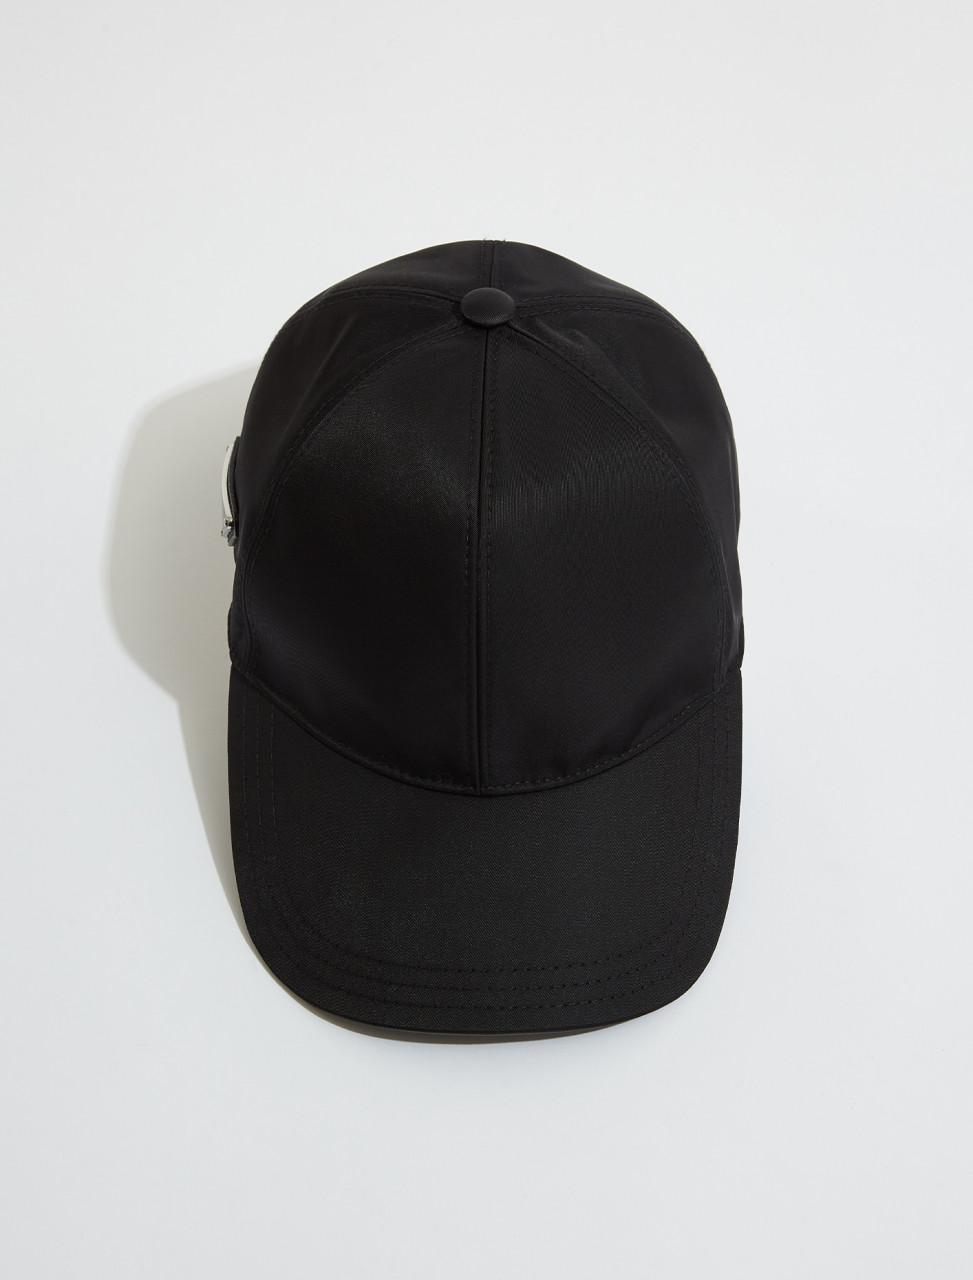 2HC274_2DMI_F0002 PRADA RE NYLON BASEBALL CAP IN BLACK